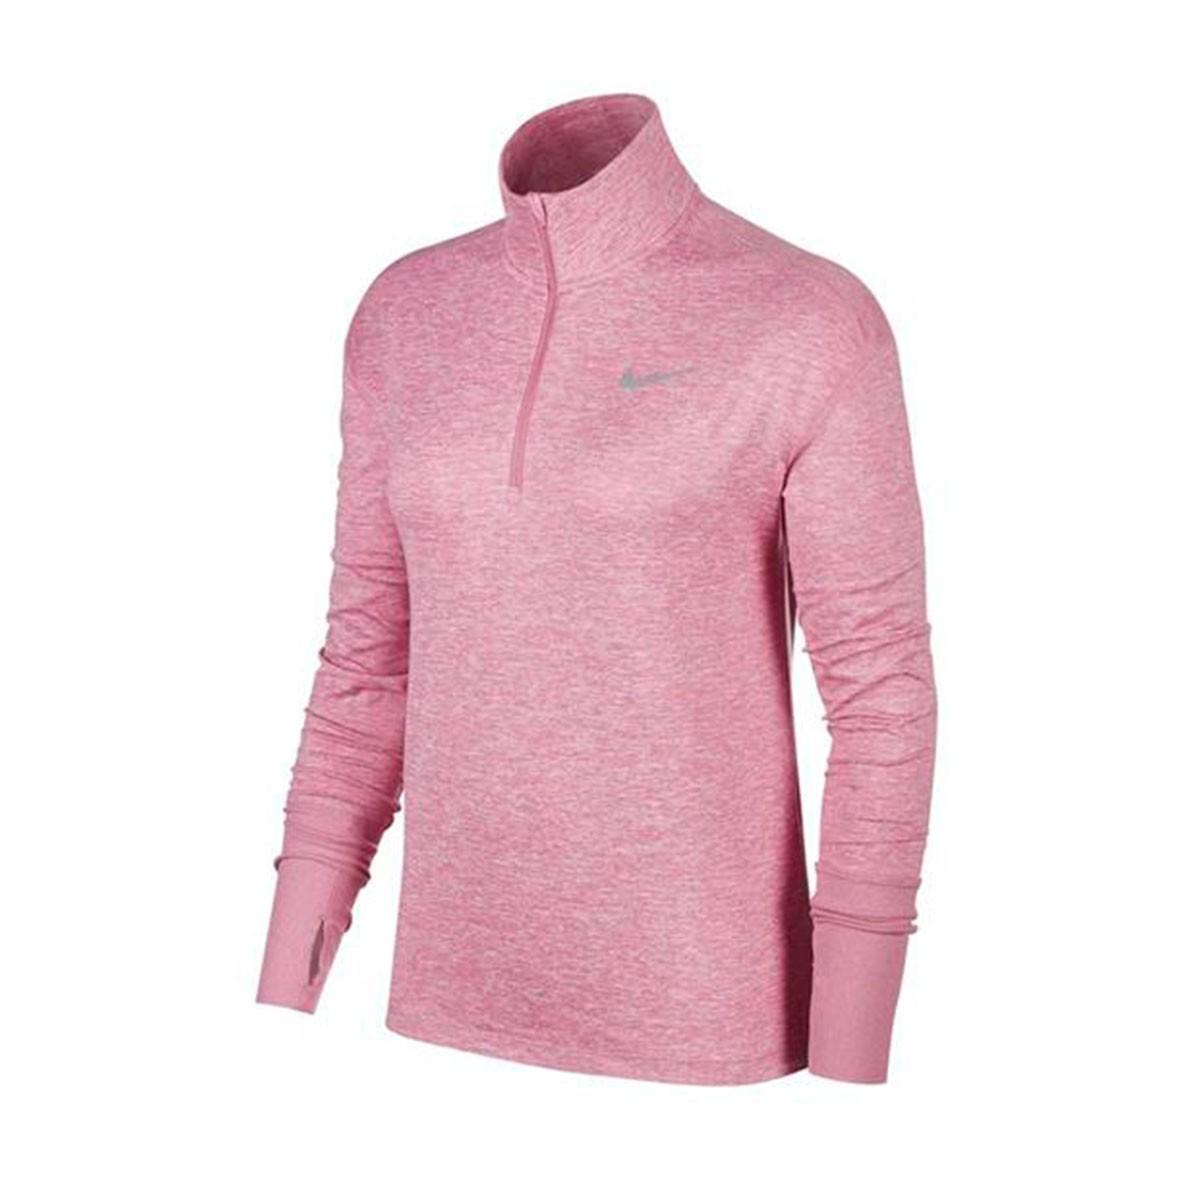 Jaqueta Nike Element Top HZ Feminina Rosa